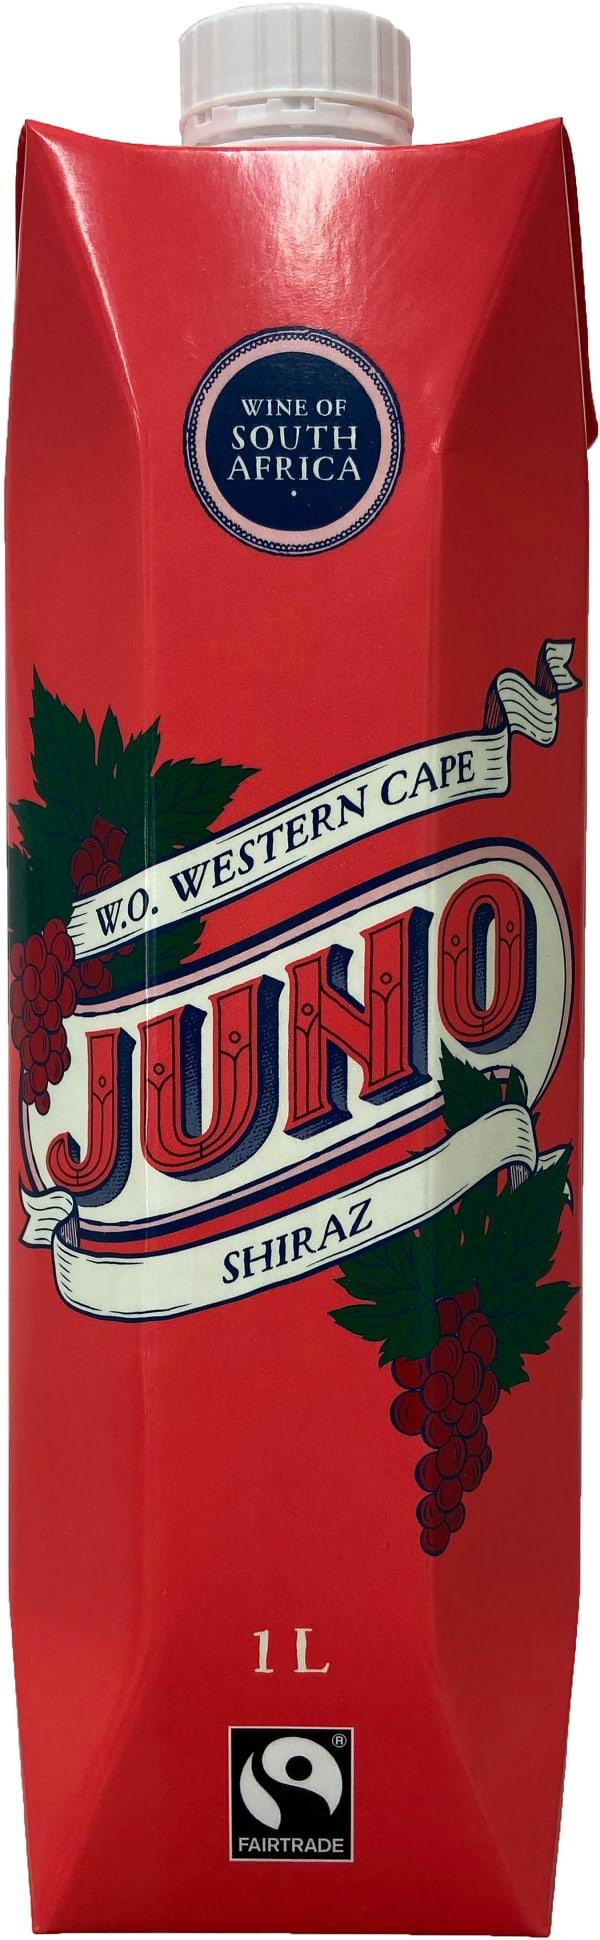 Juno Shiraz 2016 carton package